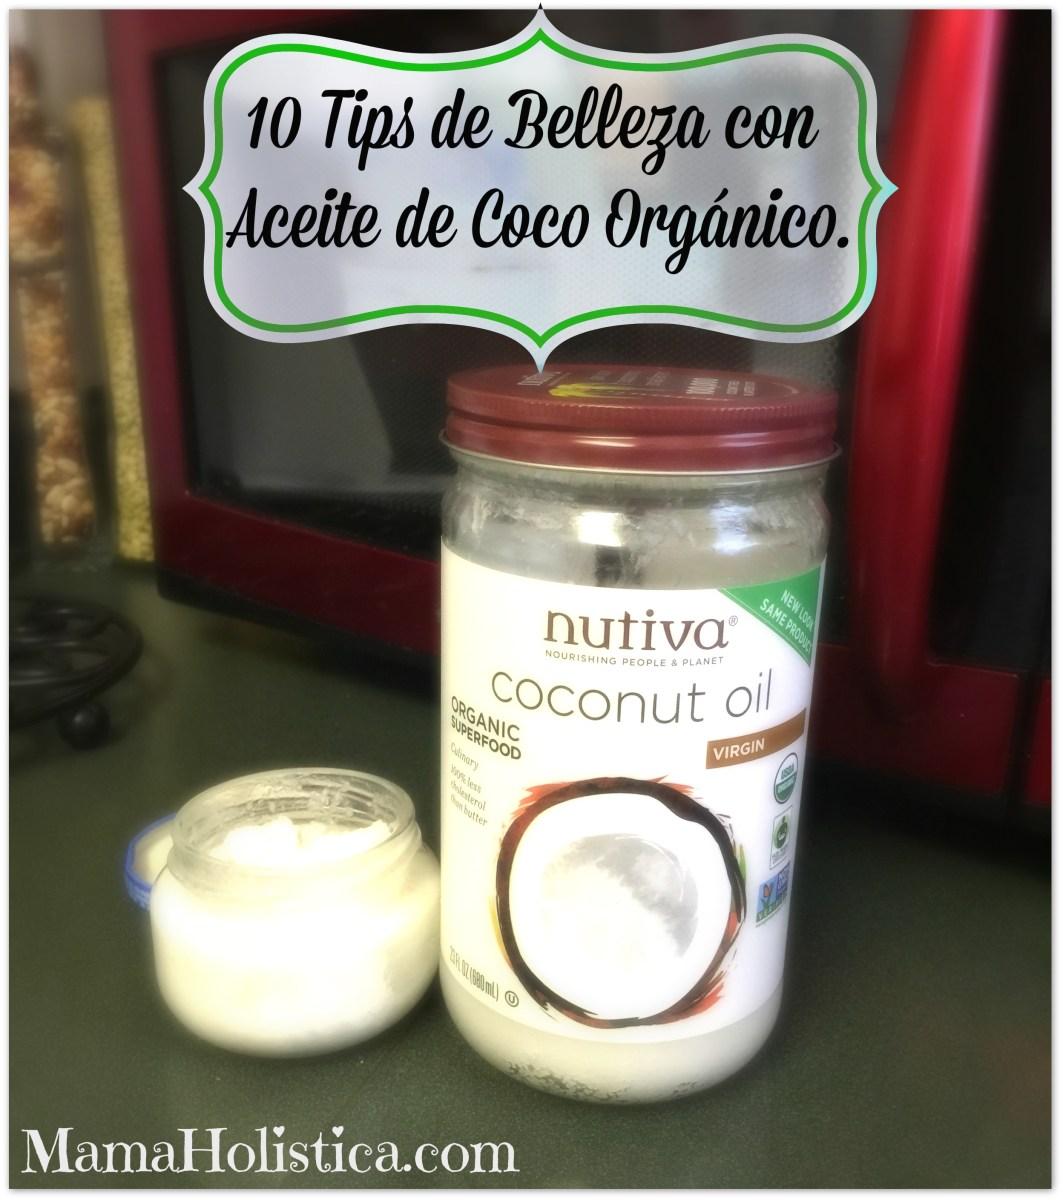 10 Tips de Belleza con Aceite de Coco Orgánico #LetsThrive #CoconutOil